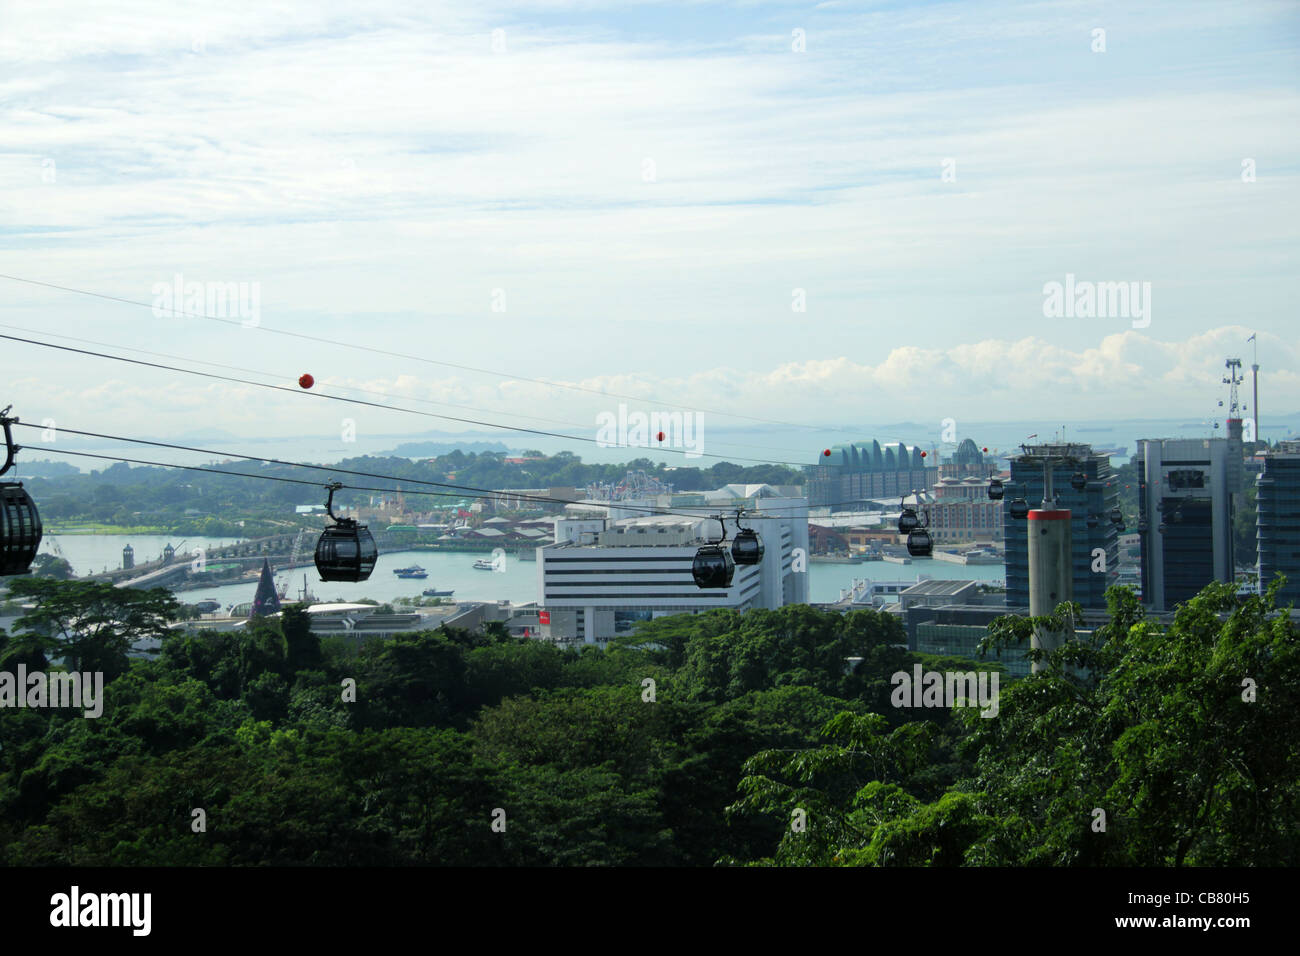 Singapore jewel cable car - Stock Image